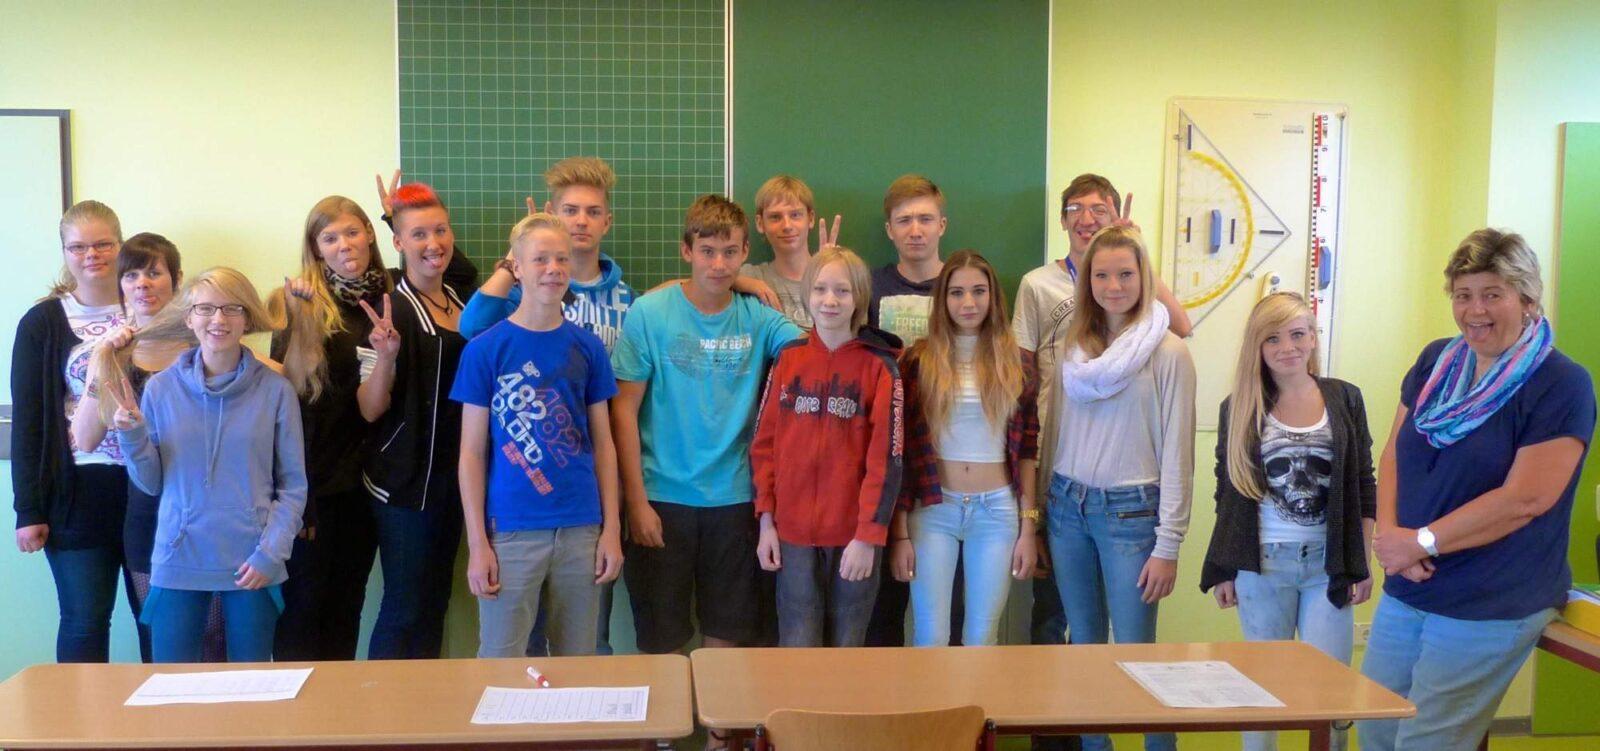 klasse-9b-2014ulk